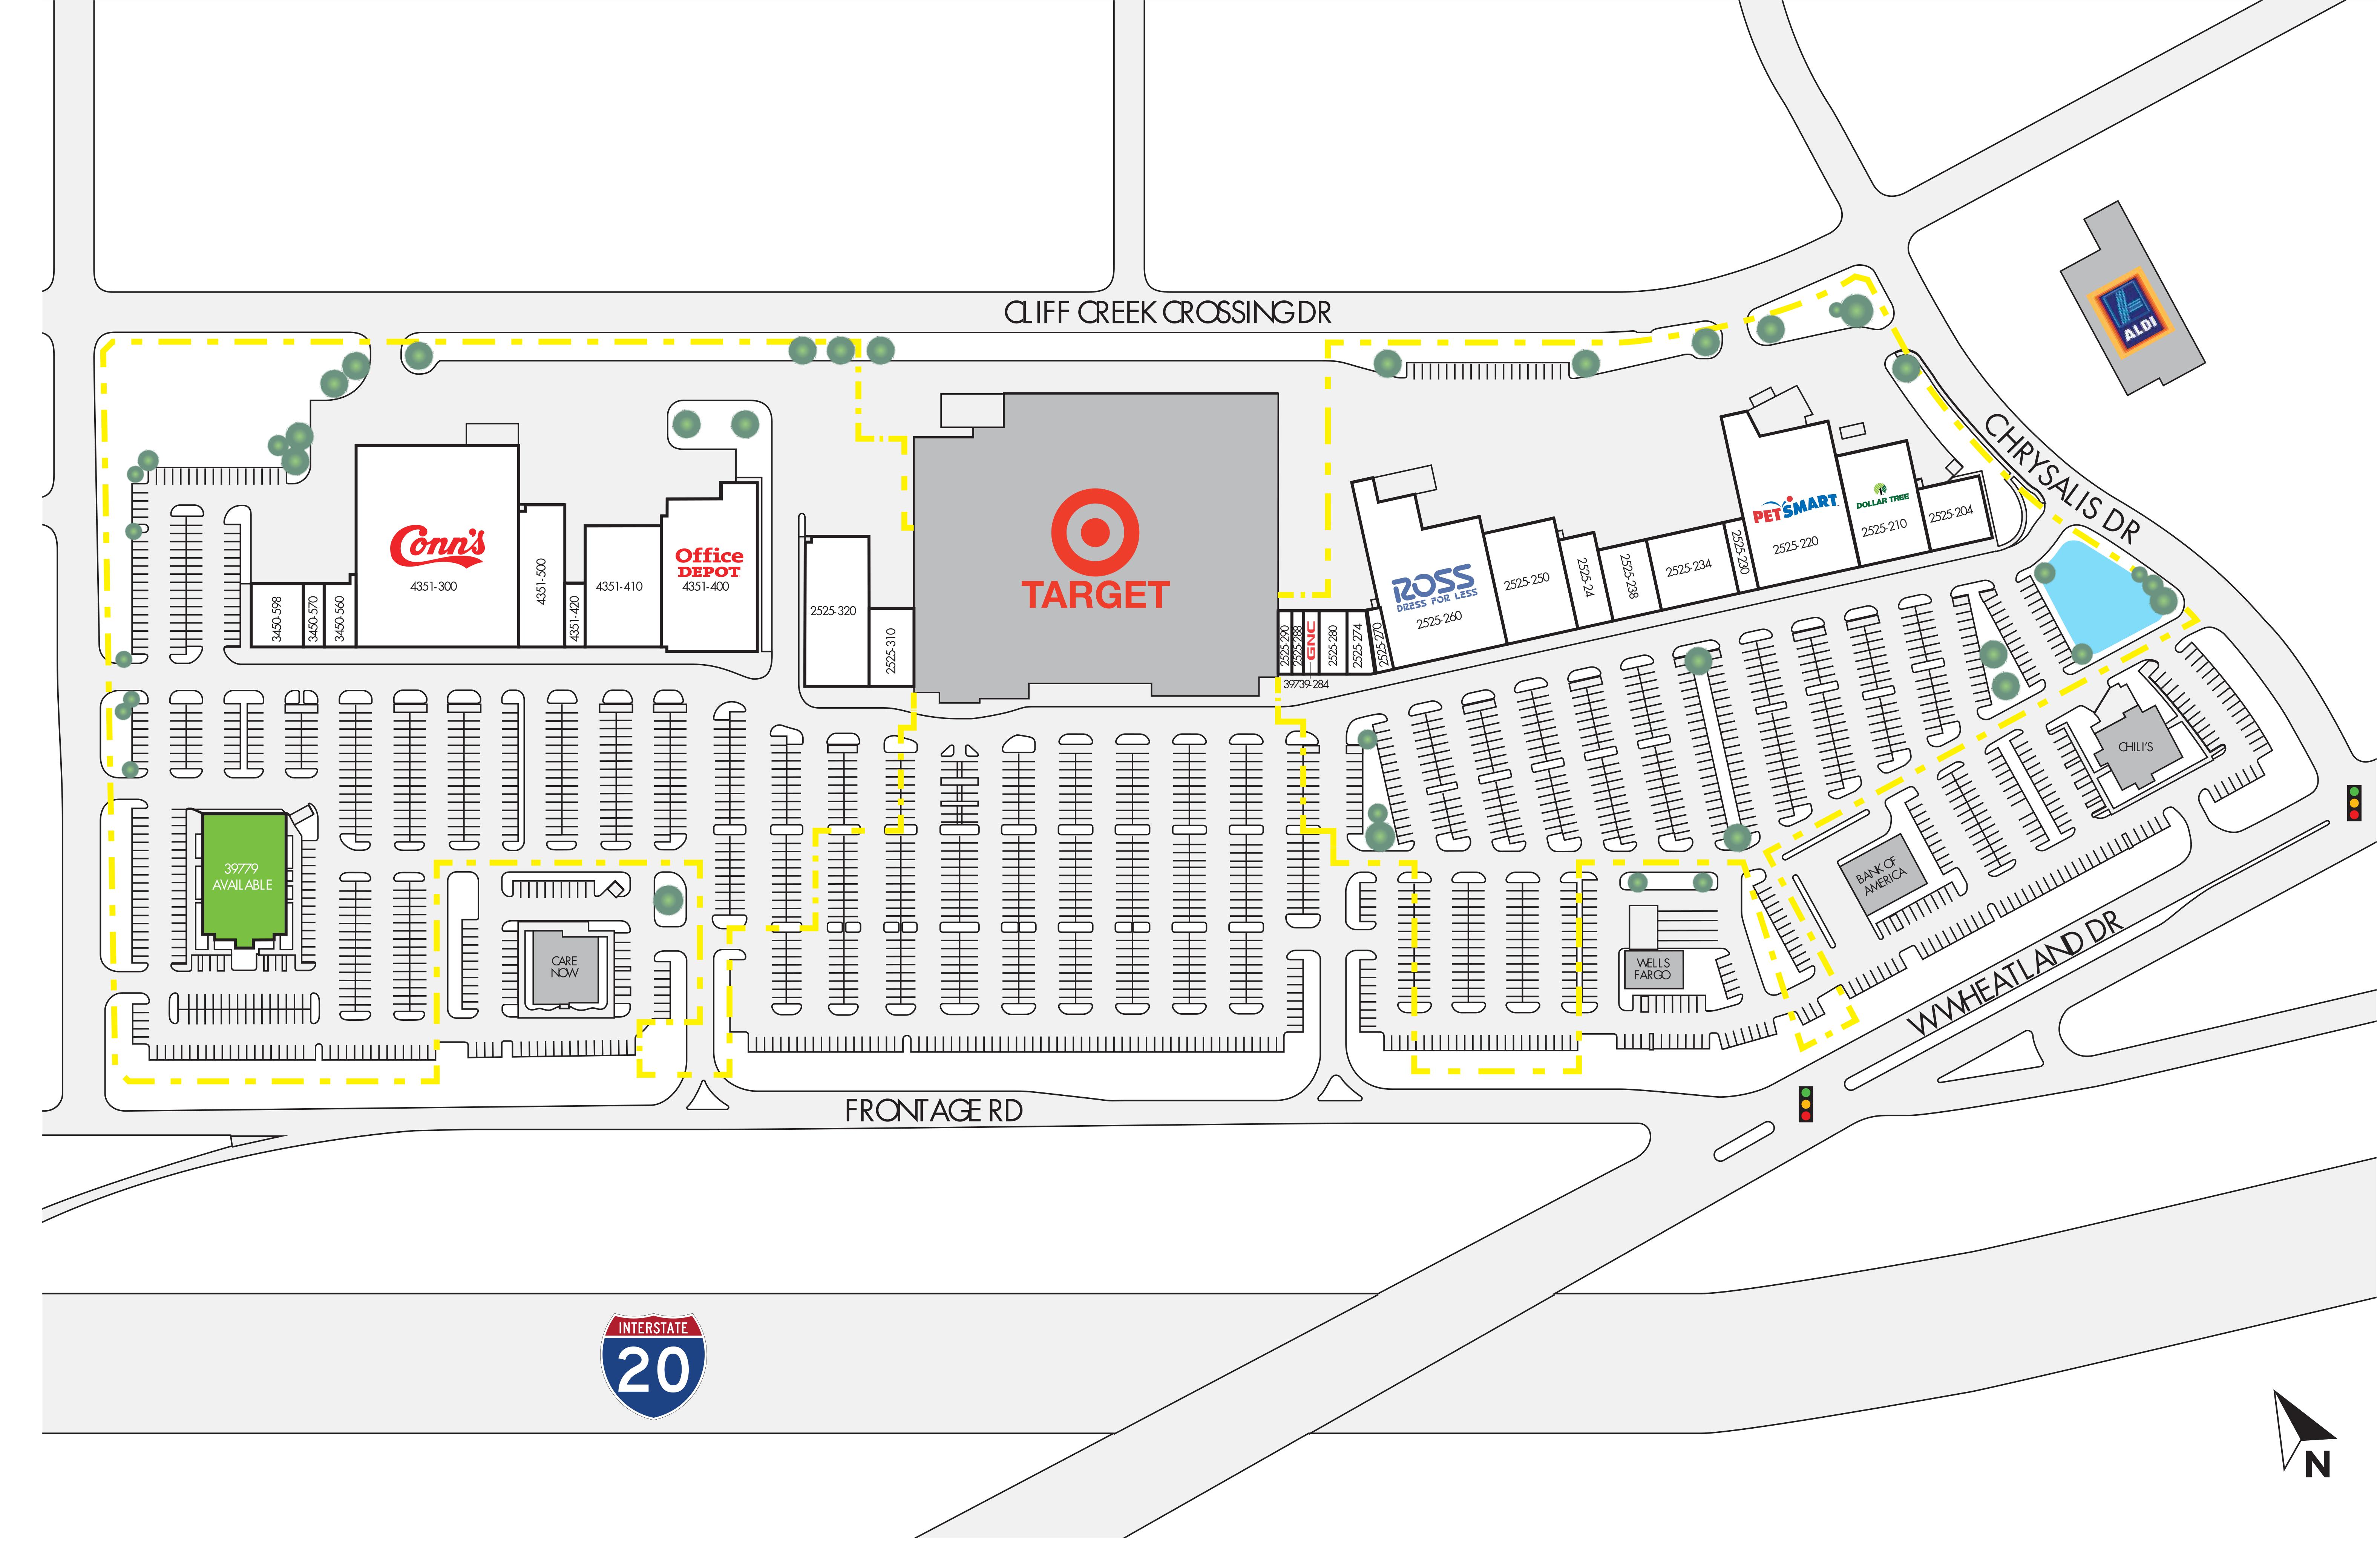 Wheatland Town Crossing: site plan